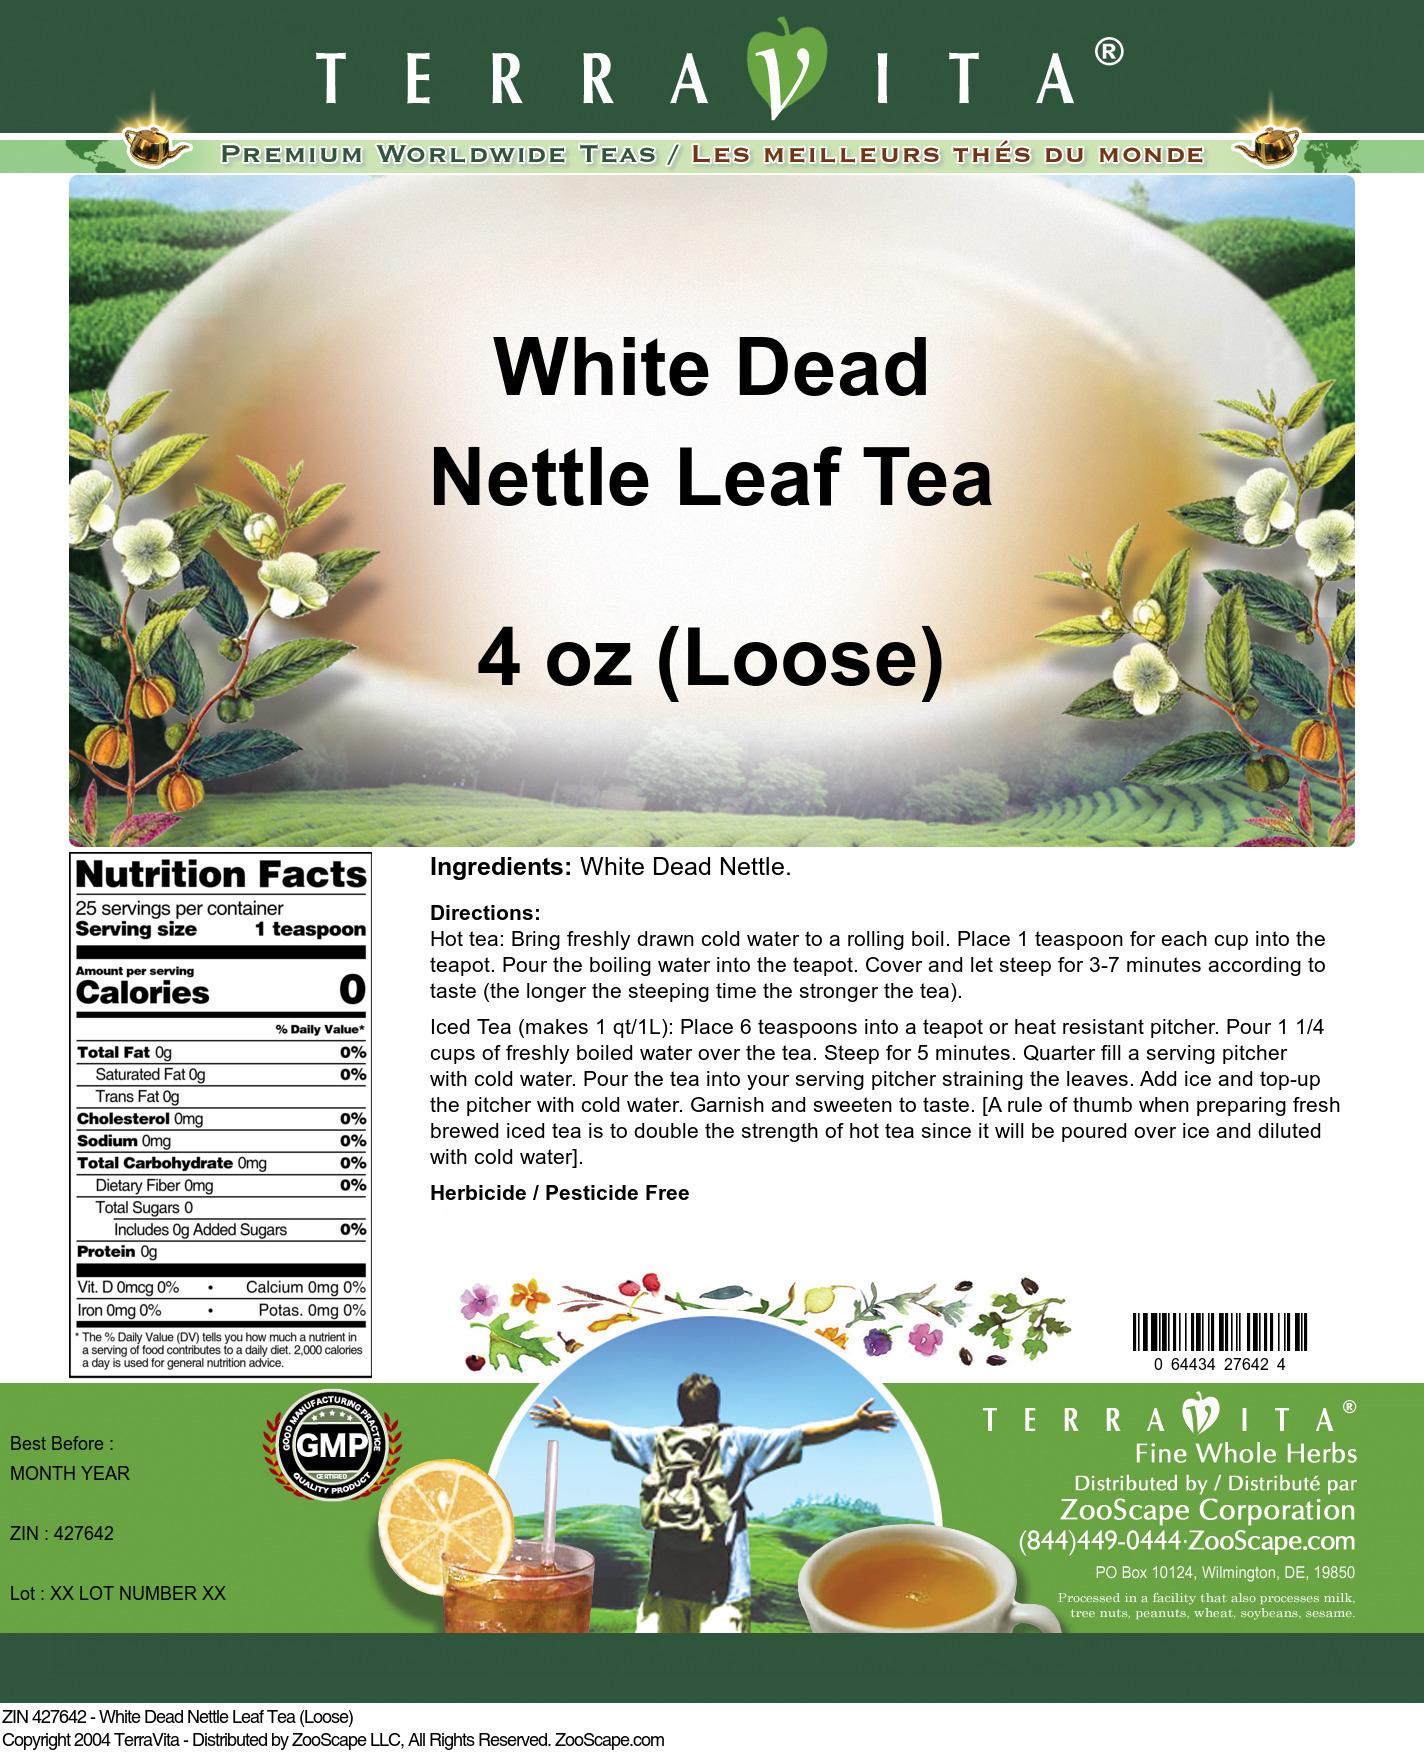 White Dead Nettle Leaf Tea (Loose)